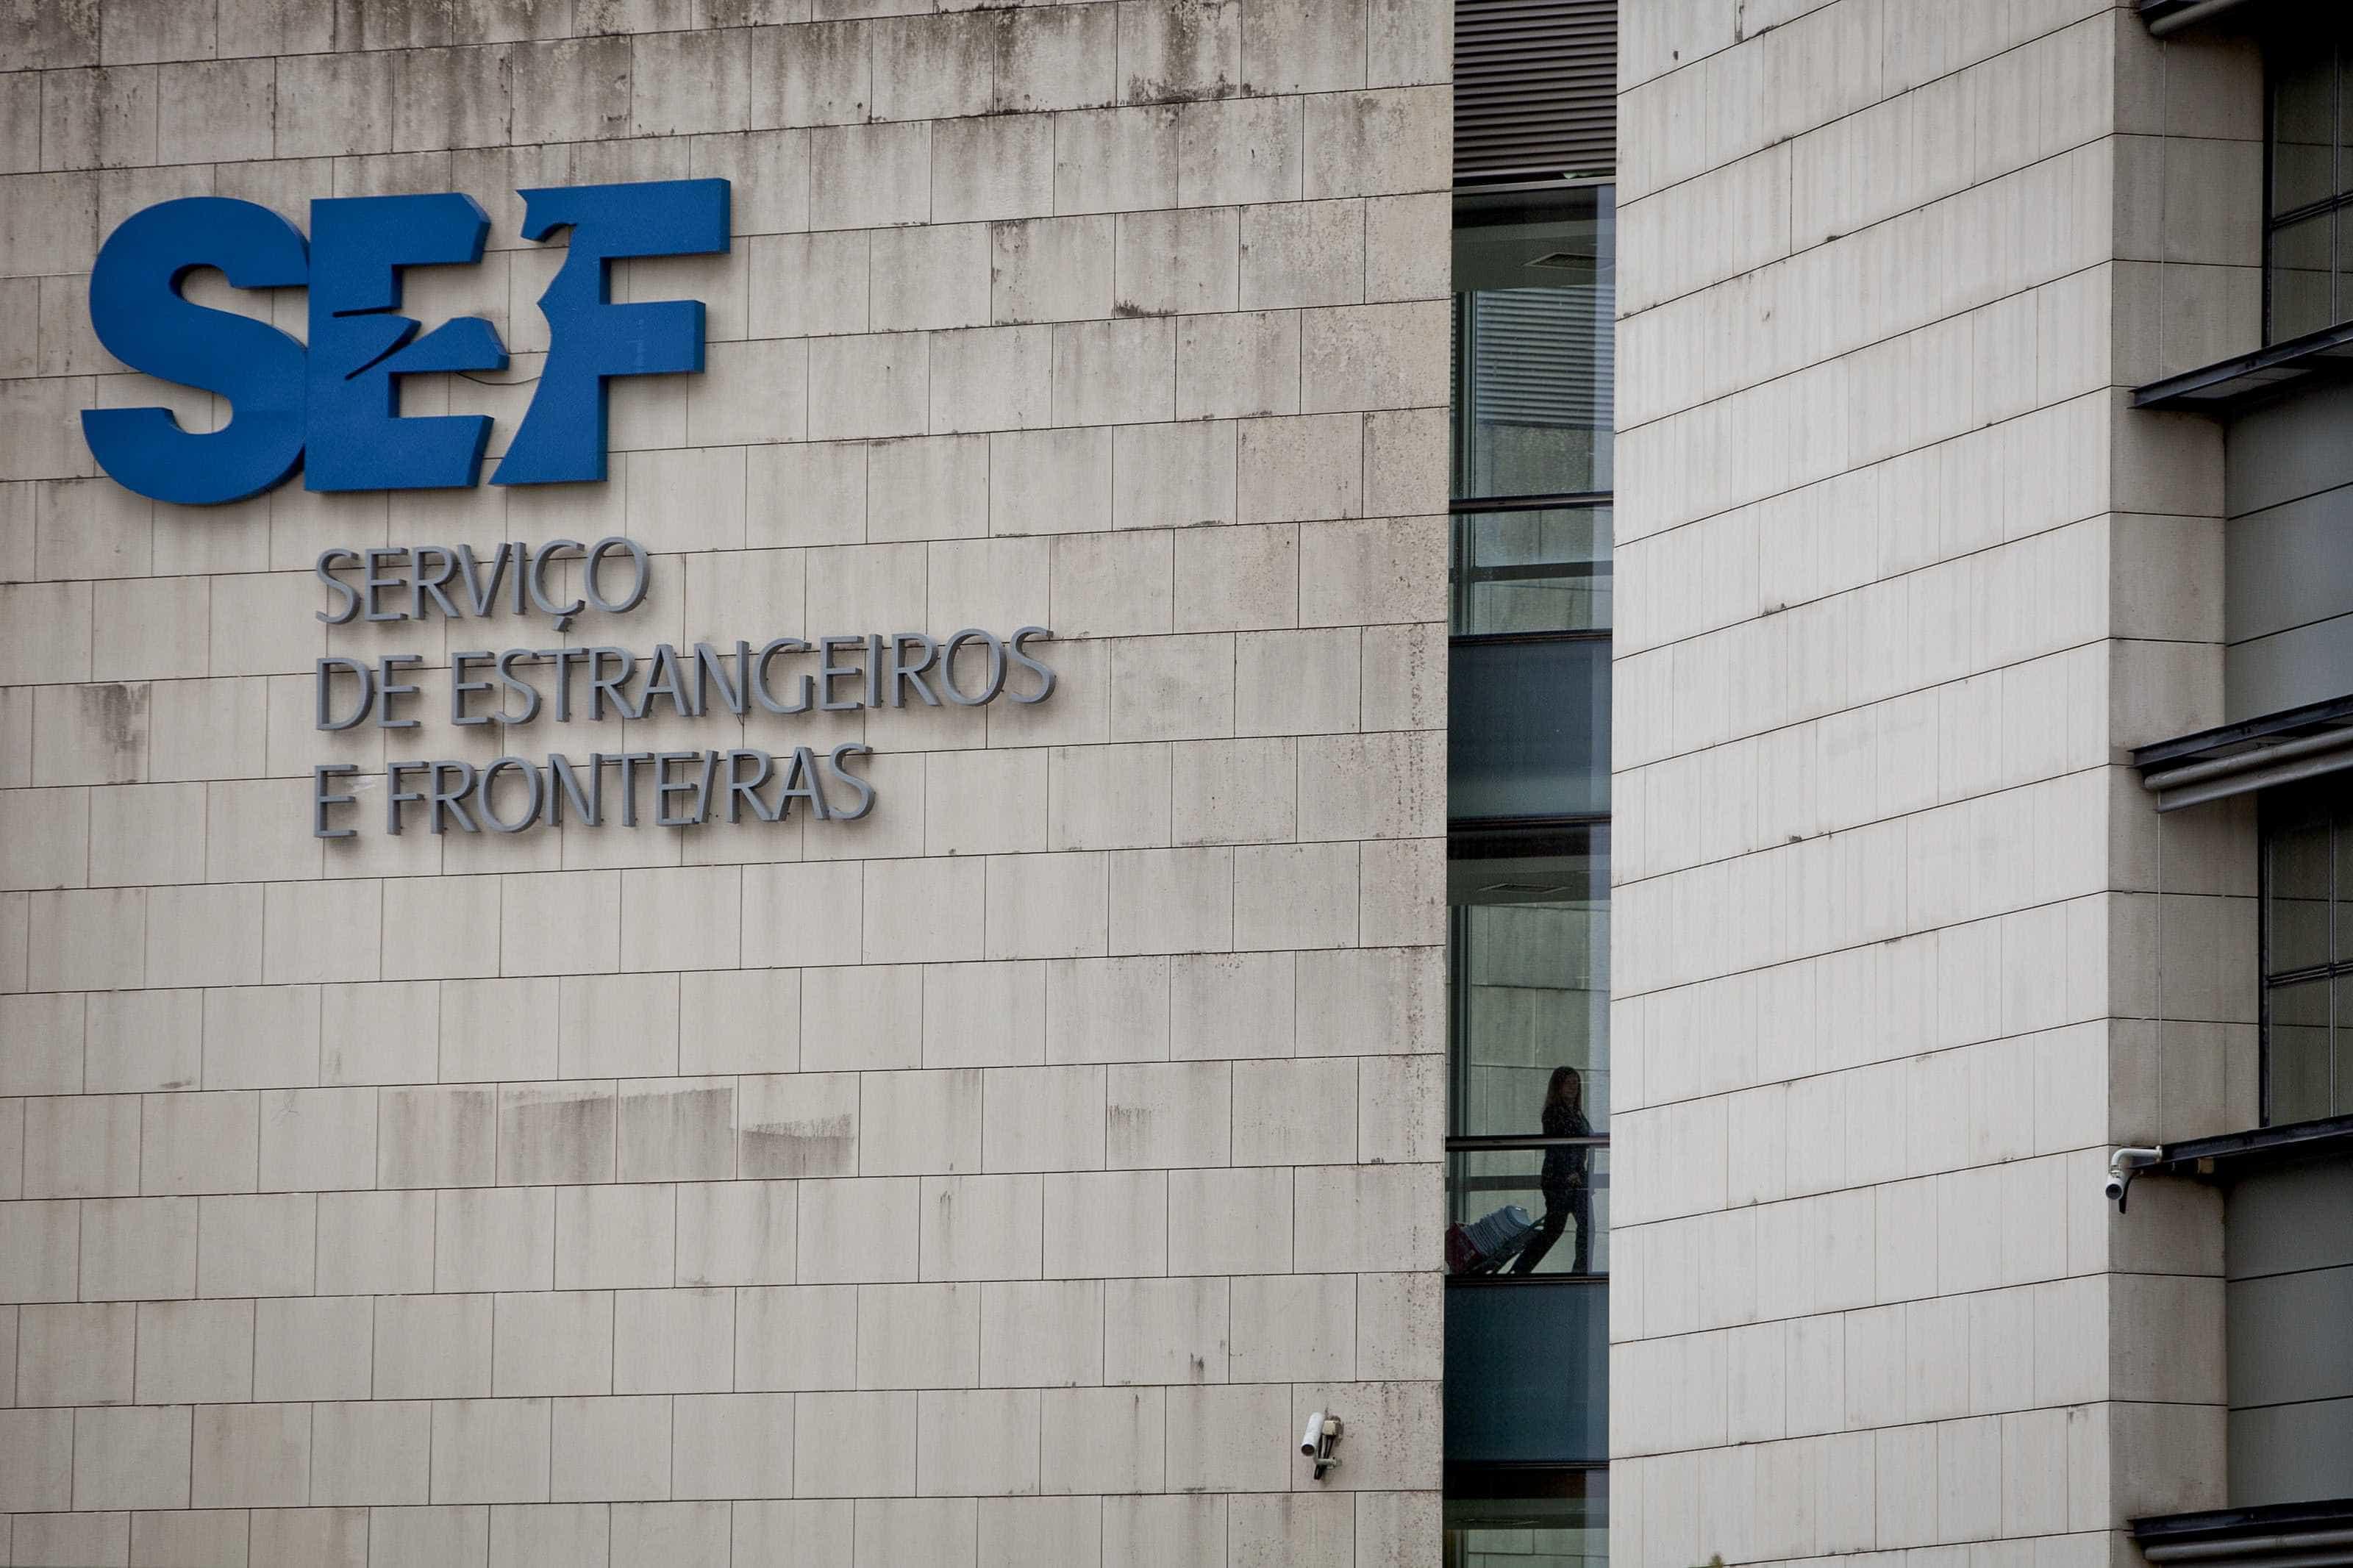 SEF deteve quatro 'correios de droga' no aeroporto de Lisboa no domingo